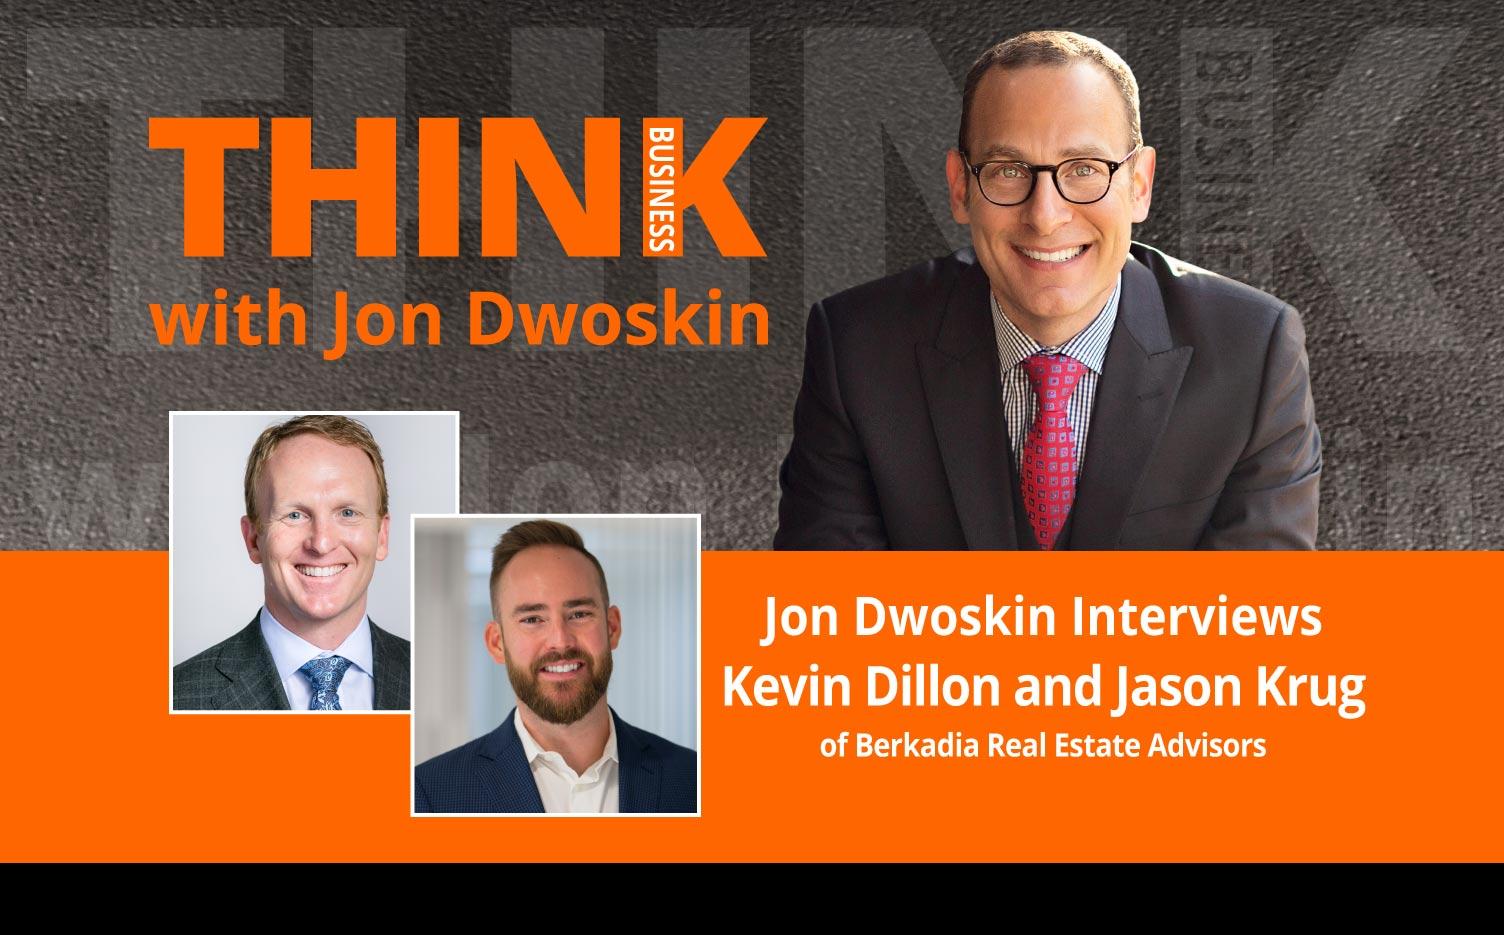 THINK Business Podcast: Jon Dwoskin Interviews Kevin Dillon and Jason Krug of Berkadia Real Estate Advisors